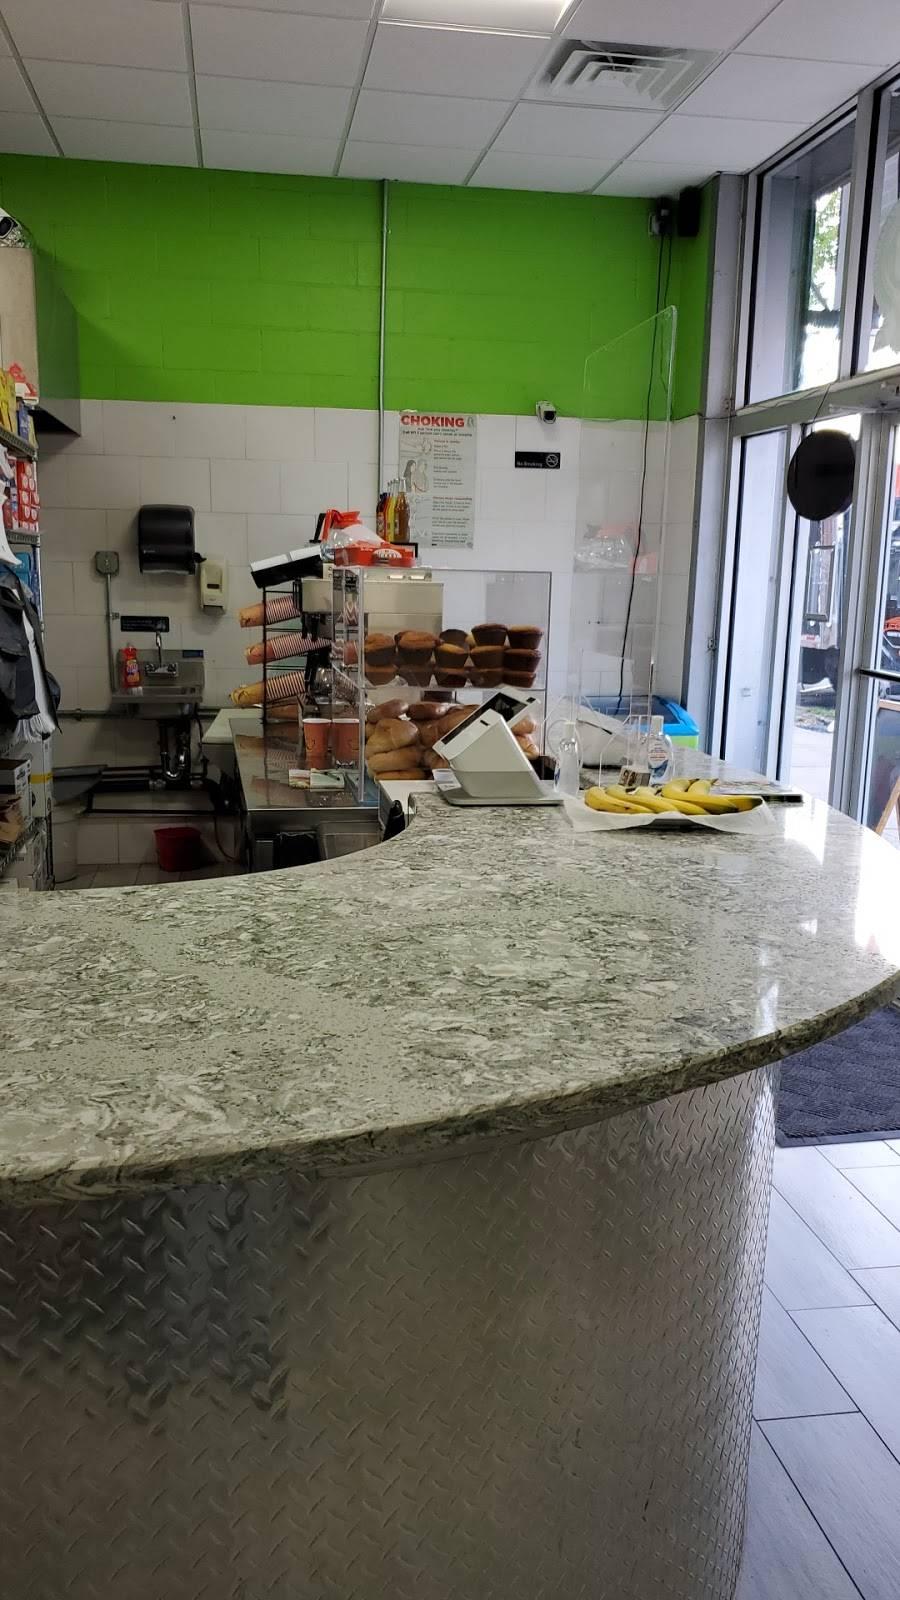 JOHNNYS CAFE | restaurant | 1232 Randall Ave, The Bronx, NY 10474, USA | 7188602330 OR +1 718-860-2330